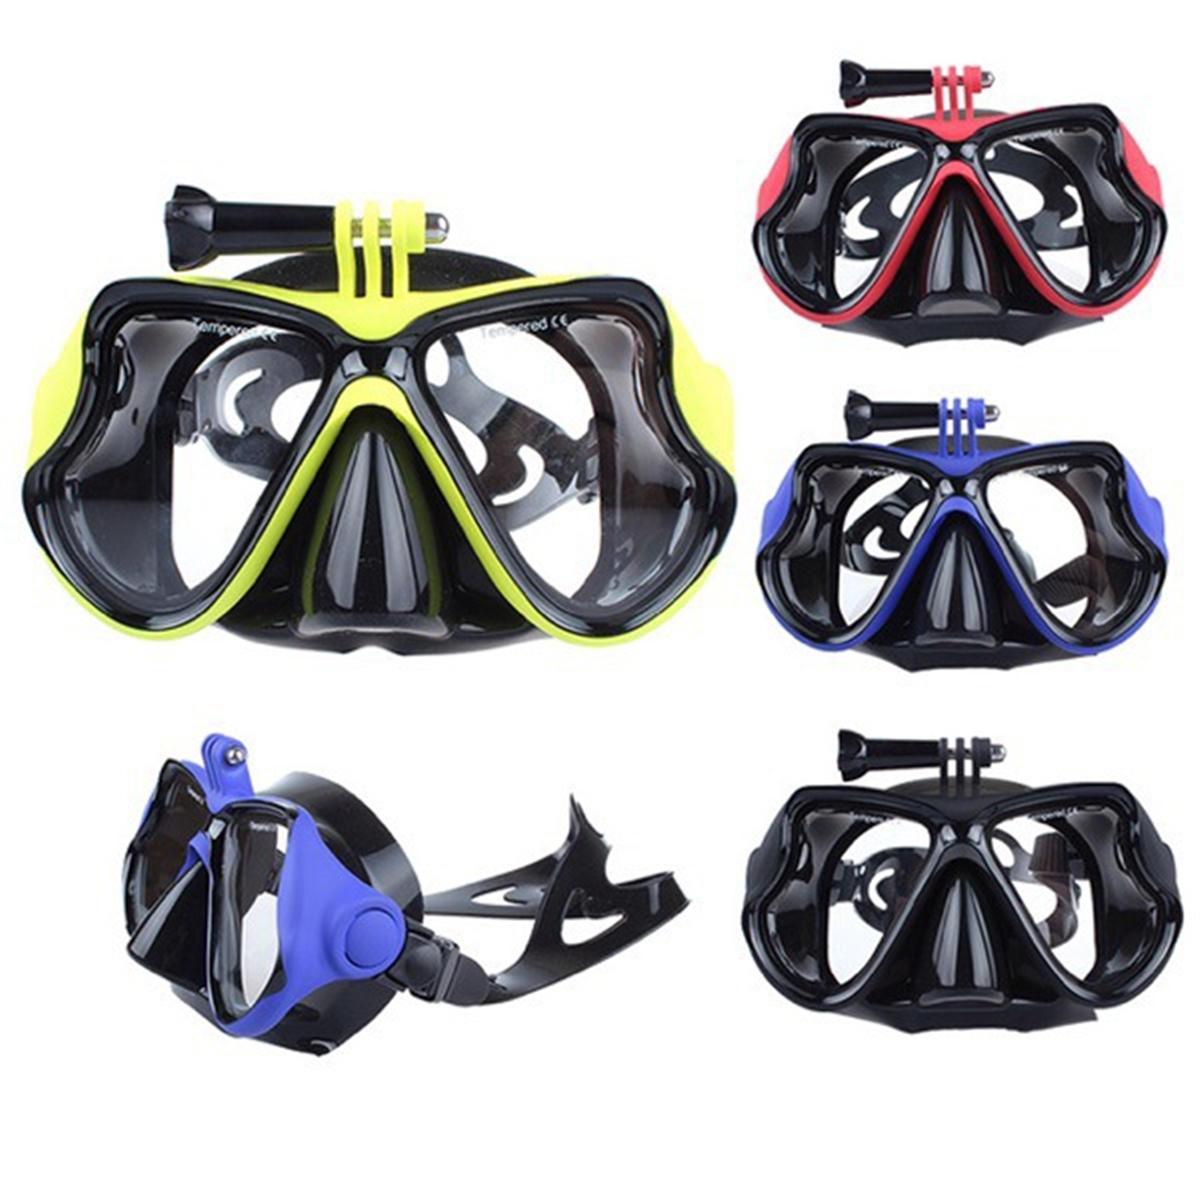 Diving Mask Scuba Snorkel Water Goggles Visage Lunettes Mount For GoPro Hero 4